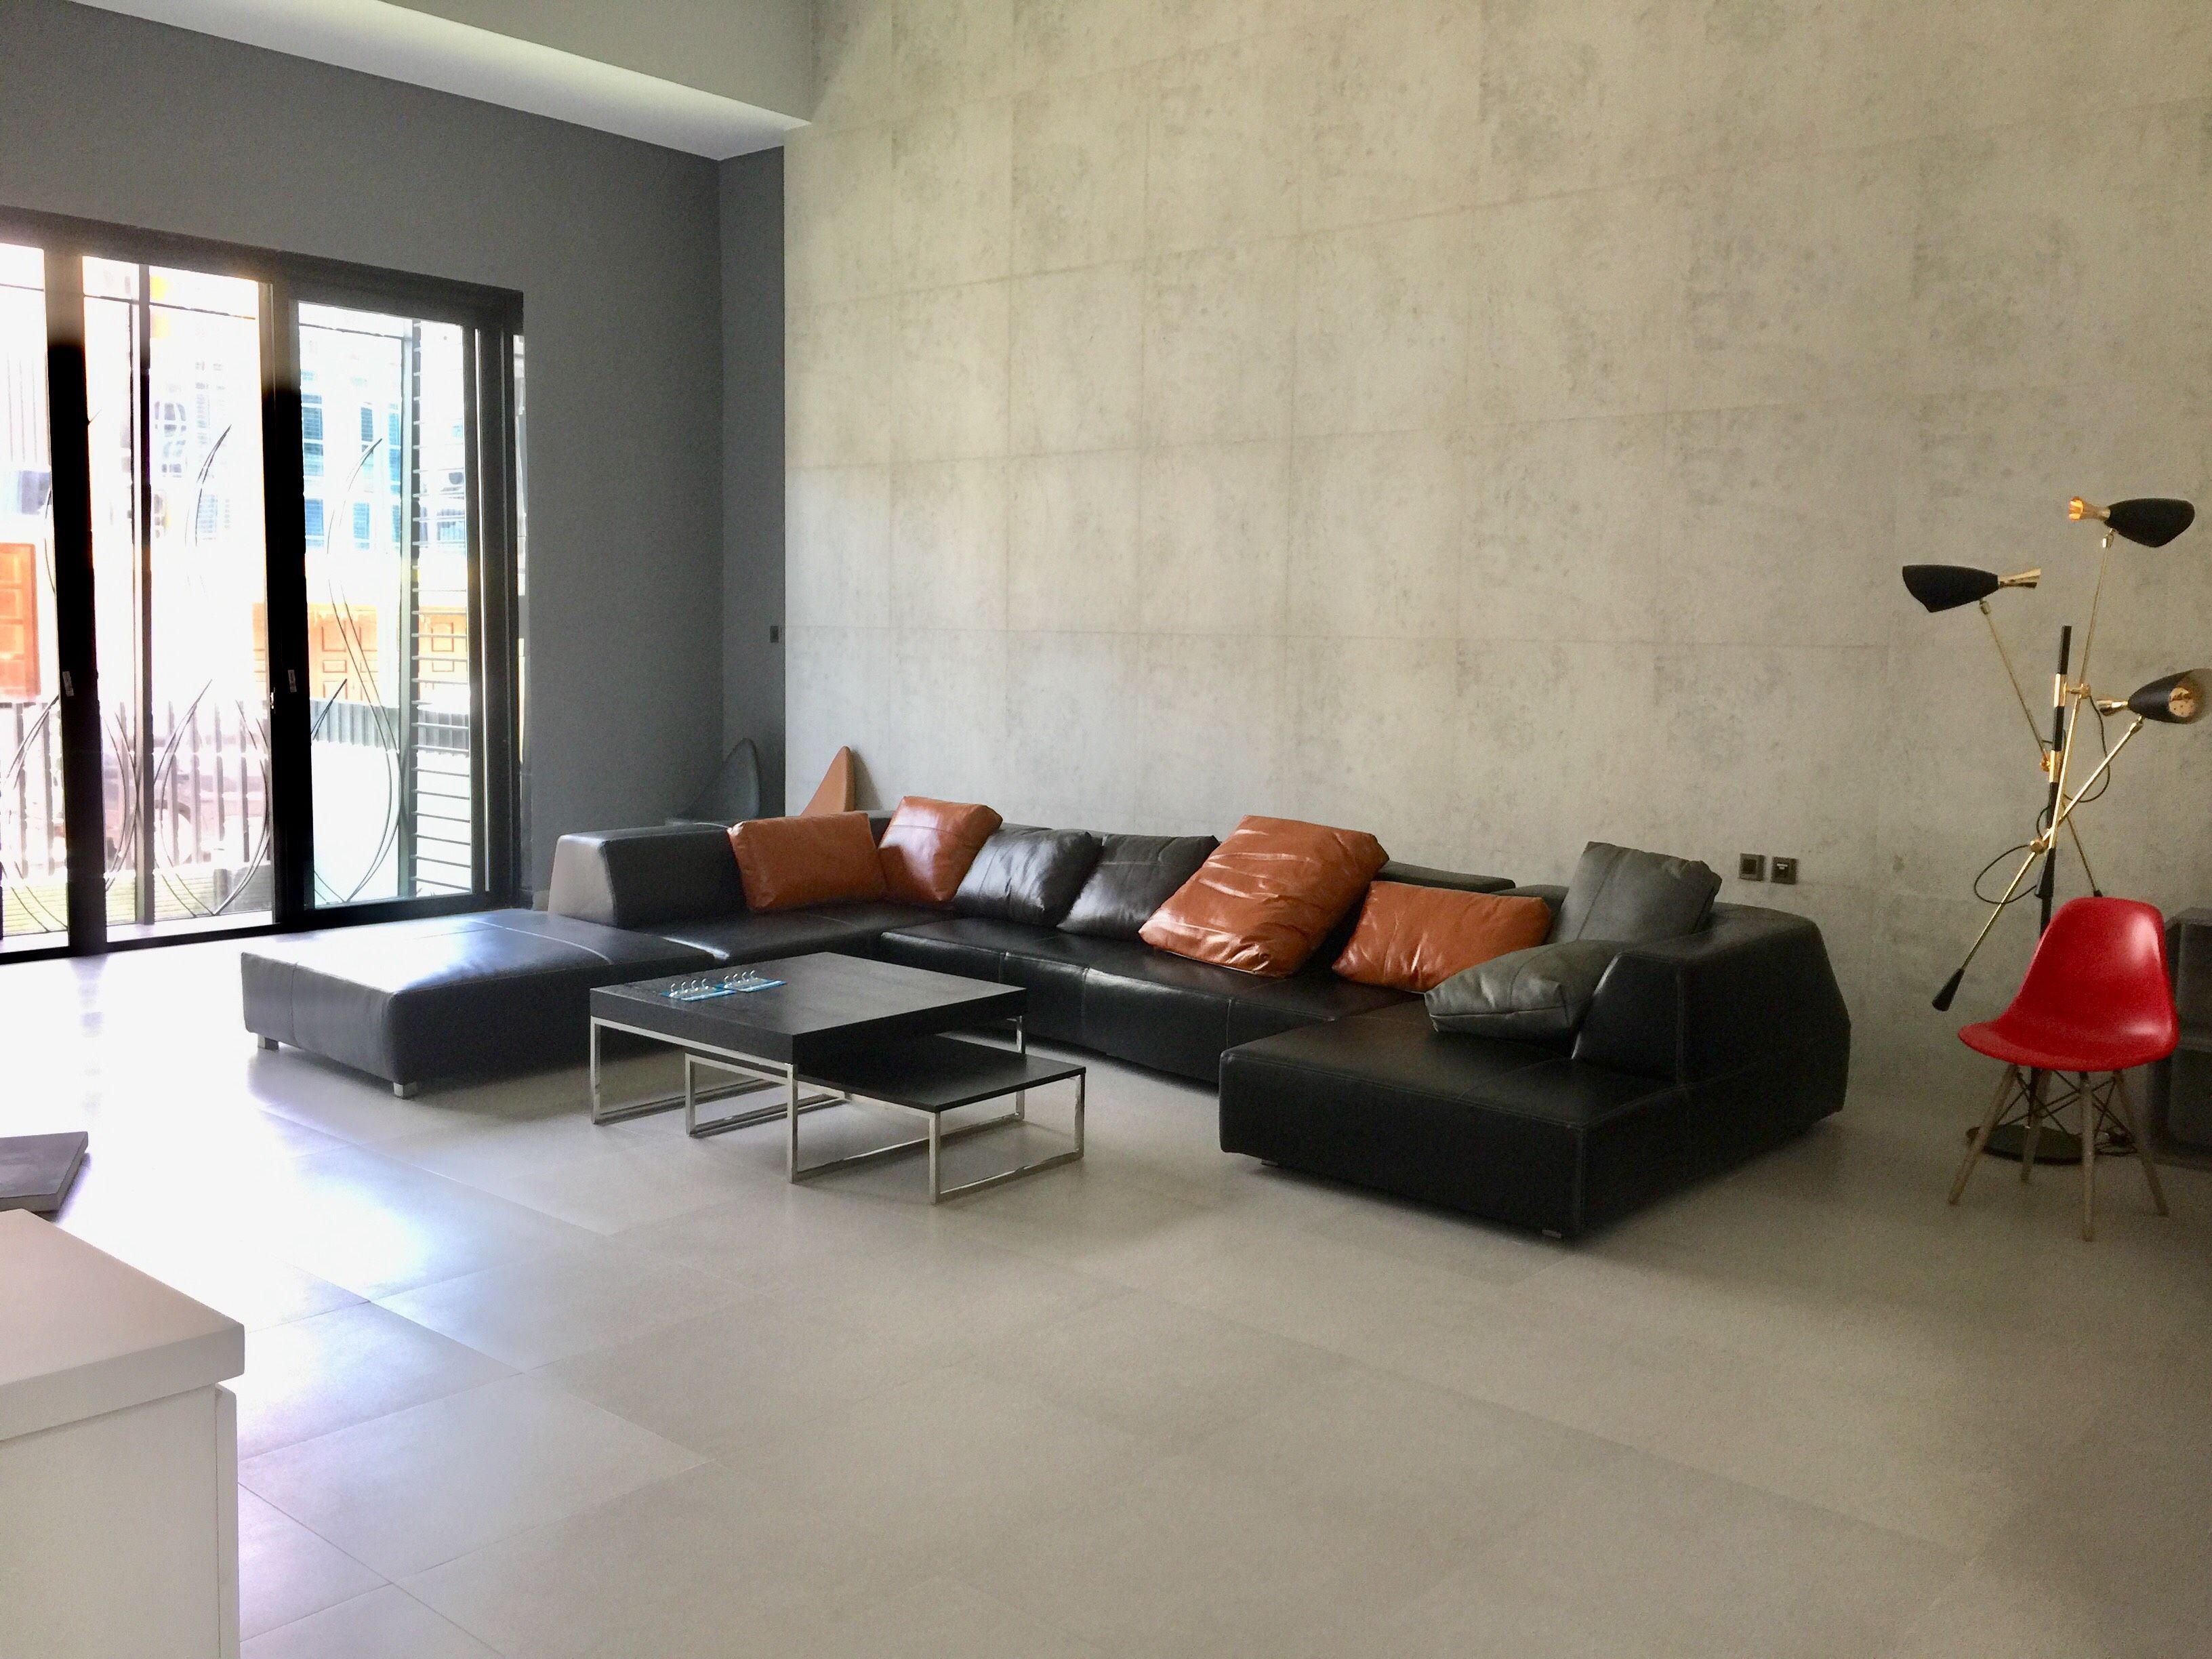 Bb Italia Bend Sofa Replica By Yadea Factorythe Large Size Modular